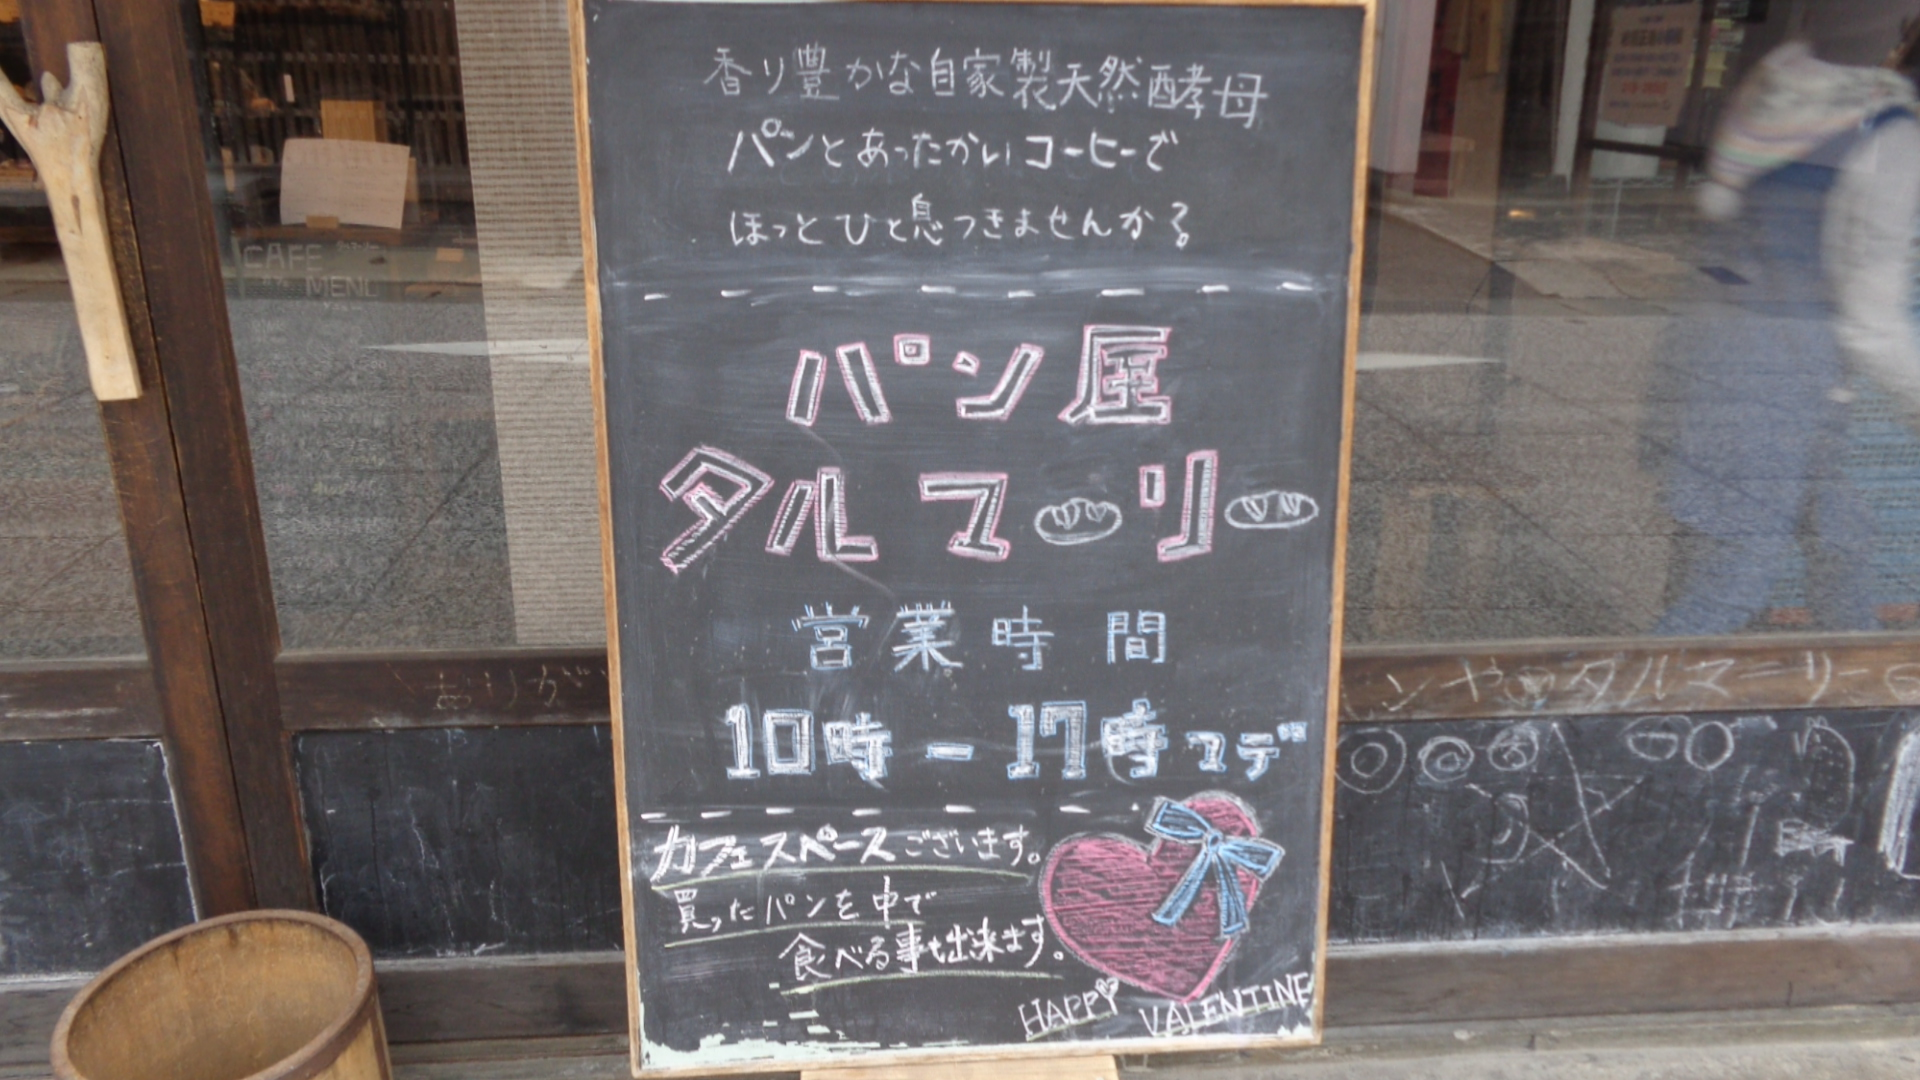 fablab hiroshima-akitakata